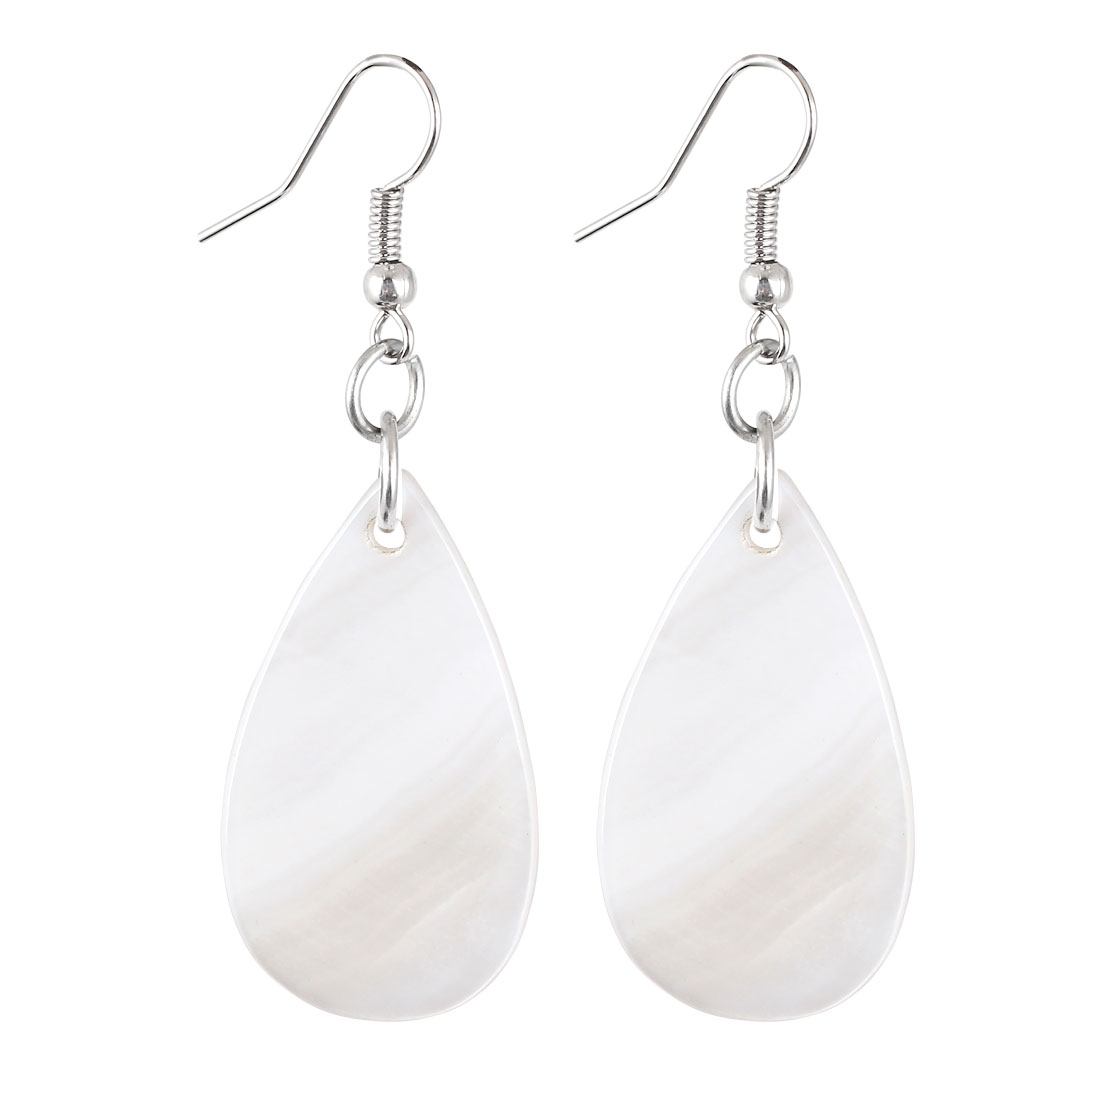 Pair White Plastic Oval Raindrop Pendant Dangling Fish Hook Ear Drops Earrings Eardrops